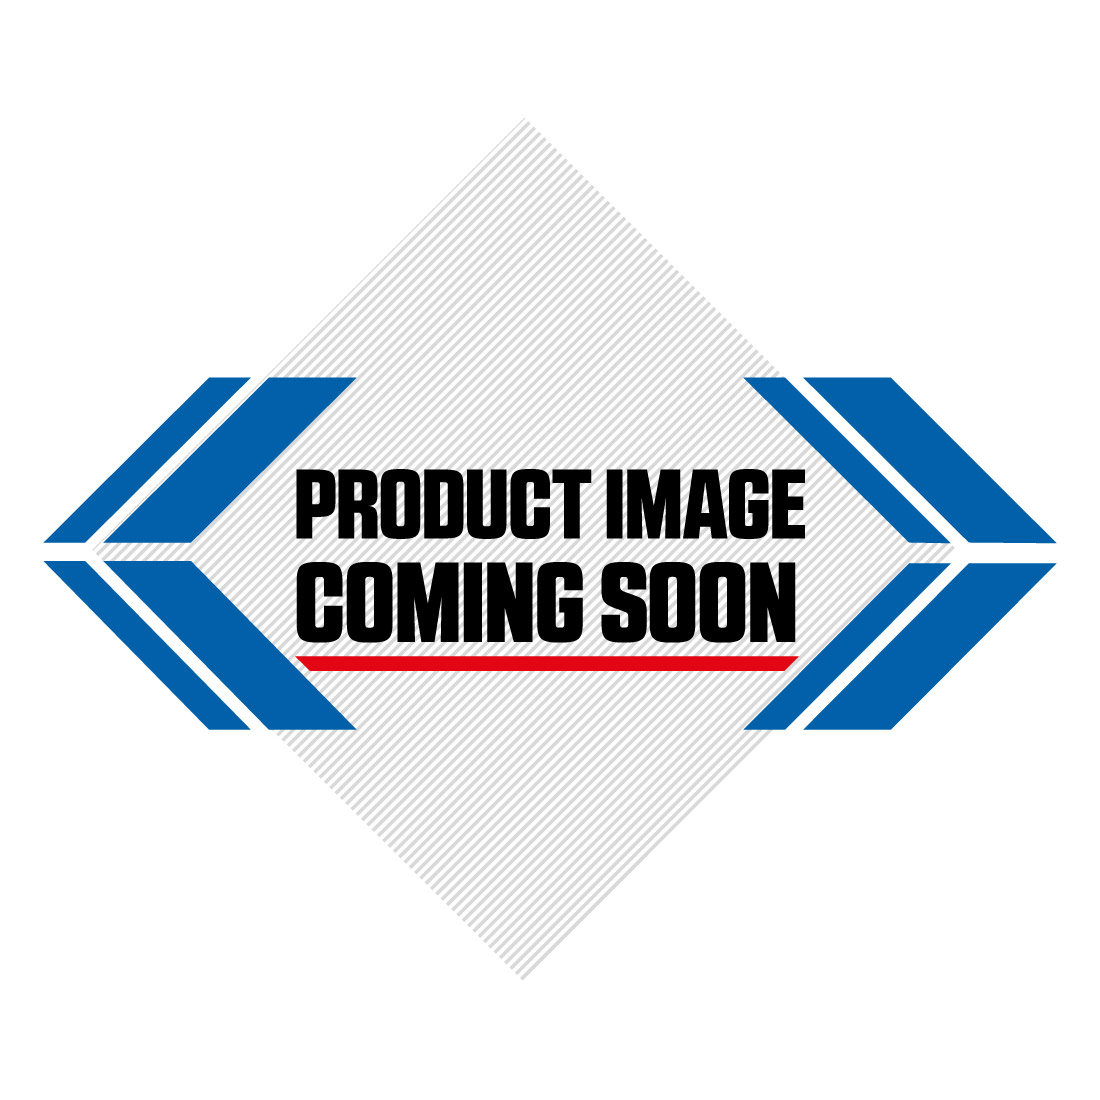 DJI Mavic Pro Fly More Combo 4K Quadcopter Drone Image-7